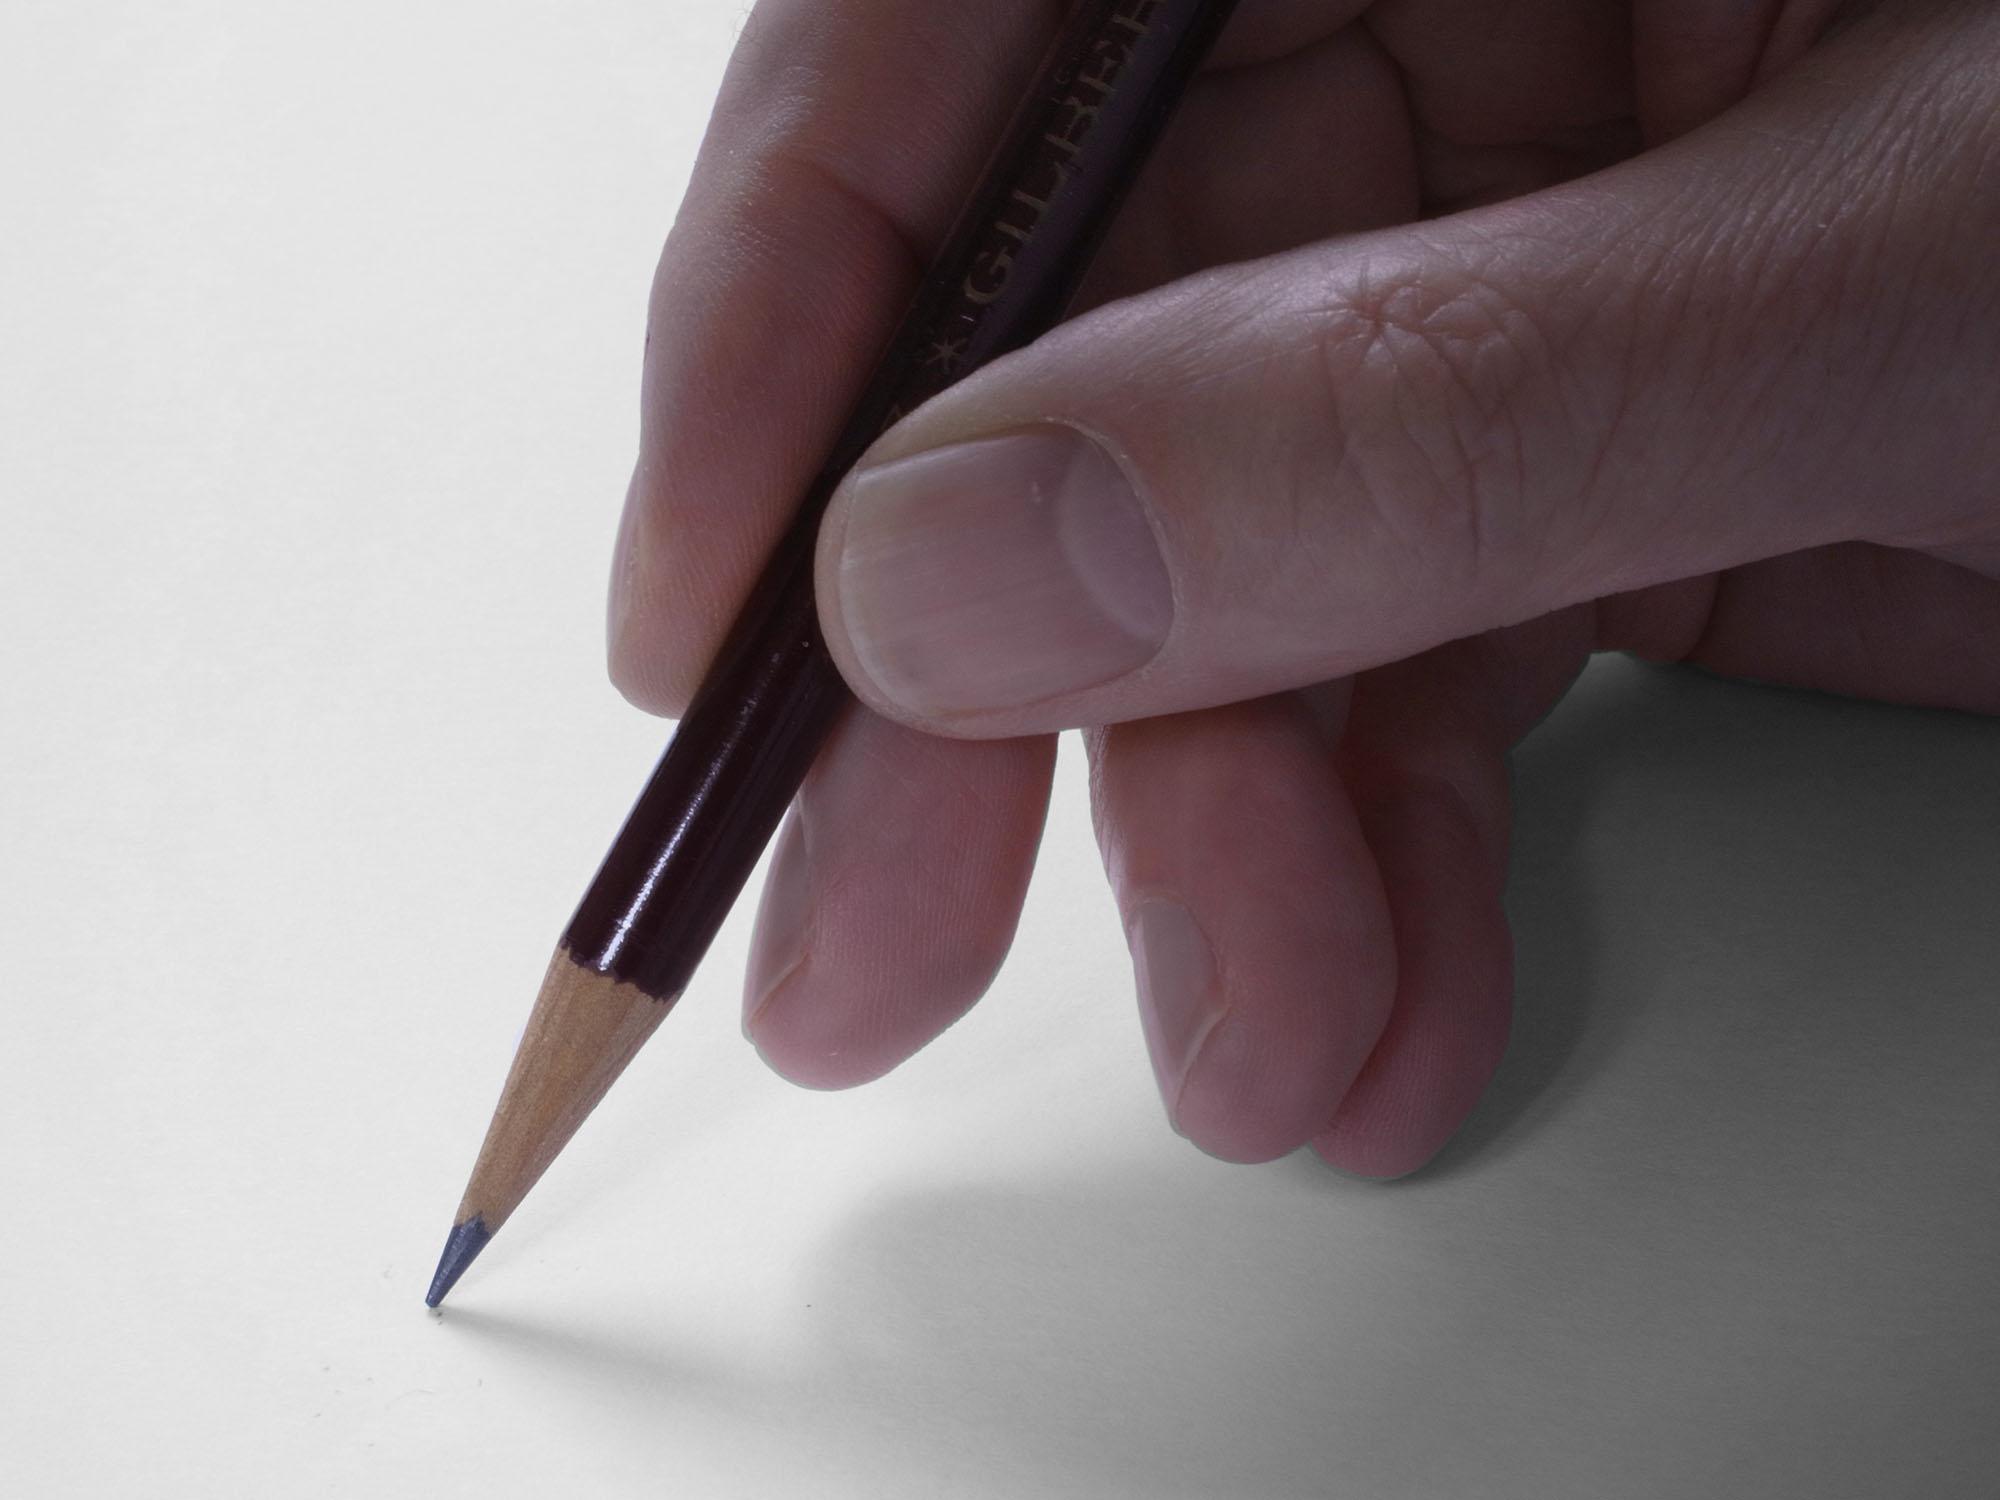 crayon gilbert jlb 2015